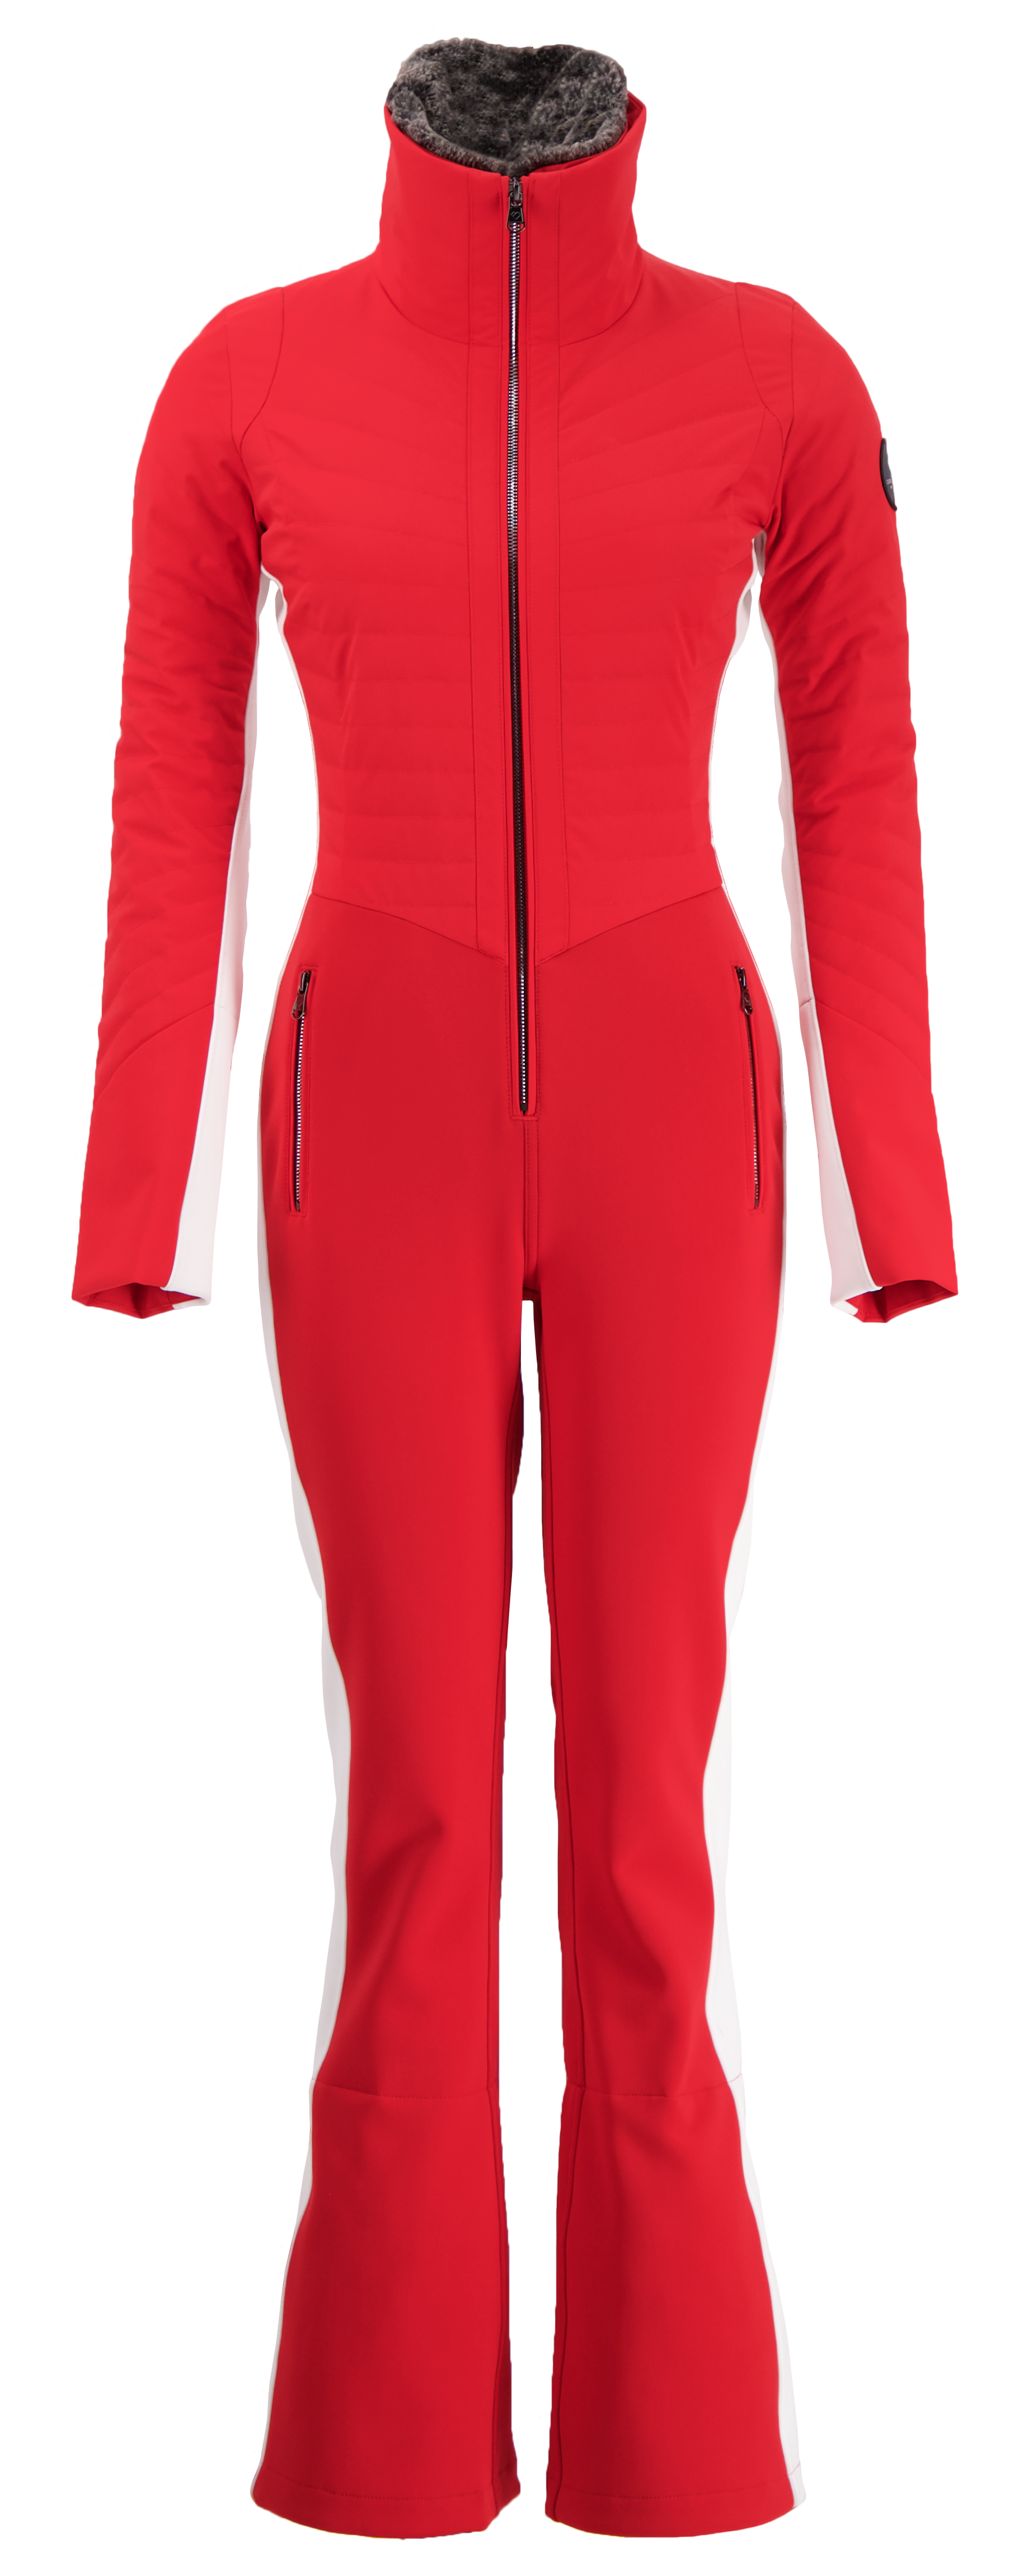 Icer Air Athletes Announced